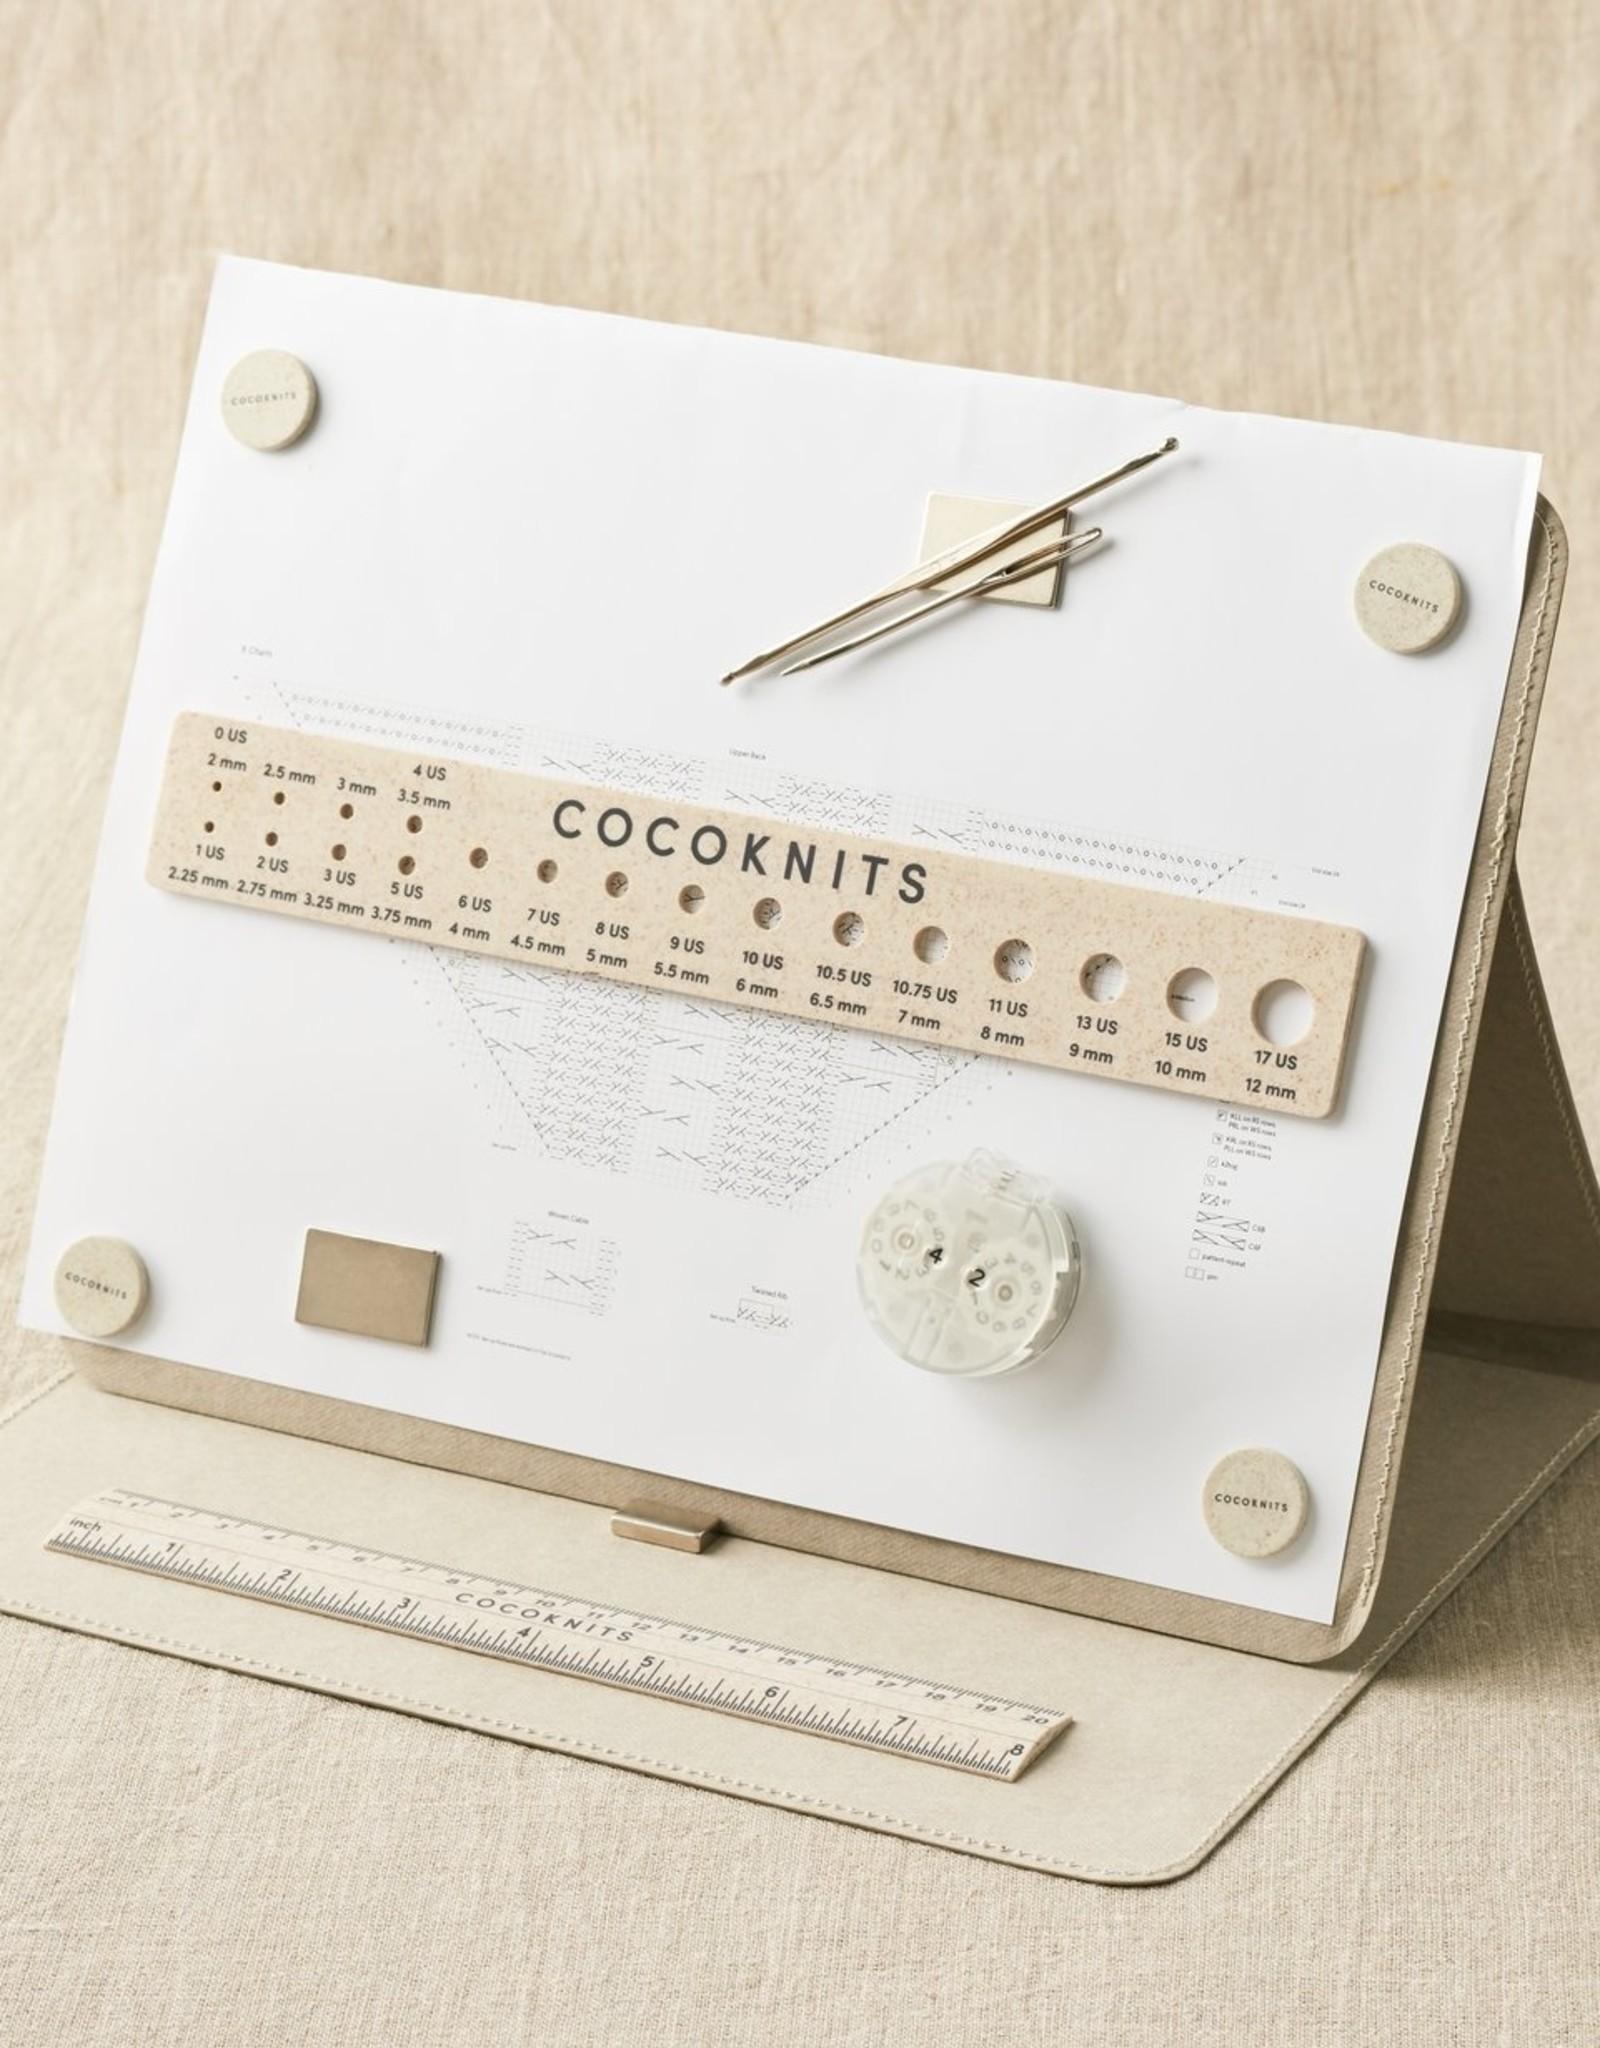 Cocoknits Cocoknits Maker's Board